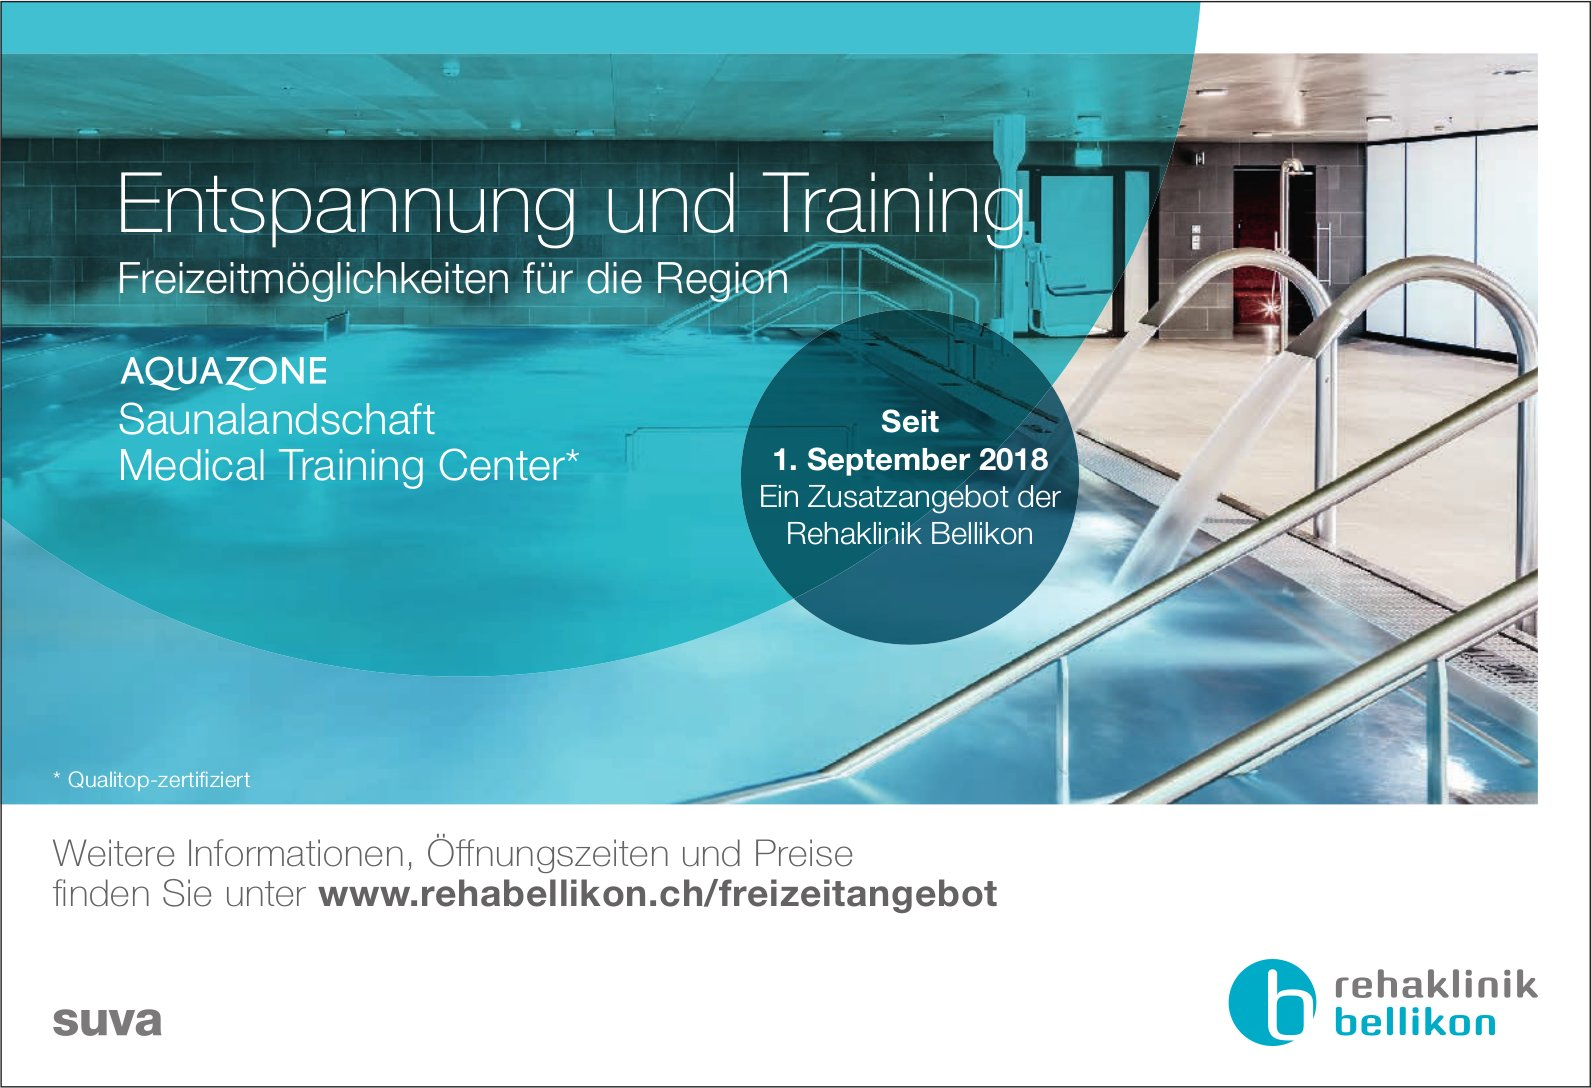 Rehaklinik Bellikon - Entspannung und Training